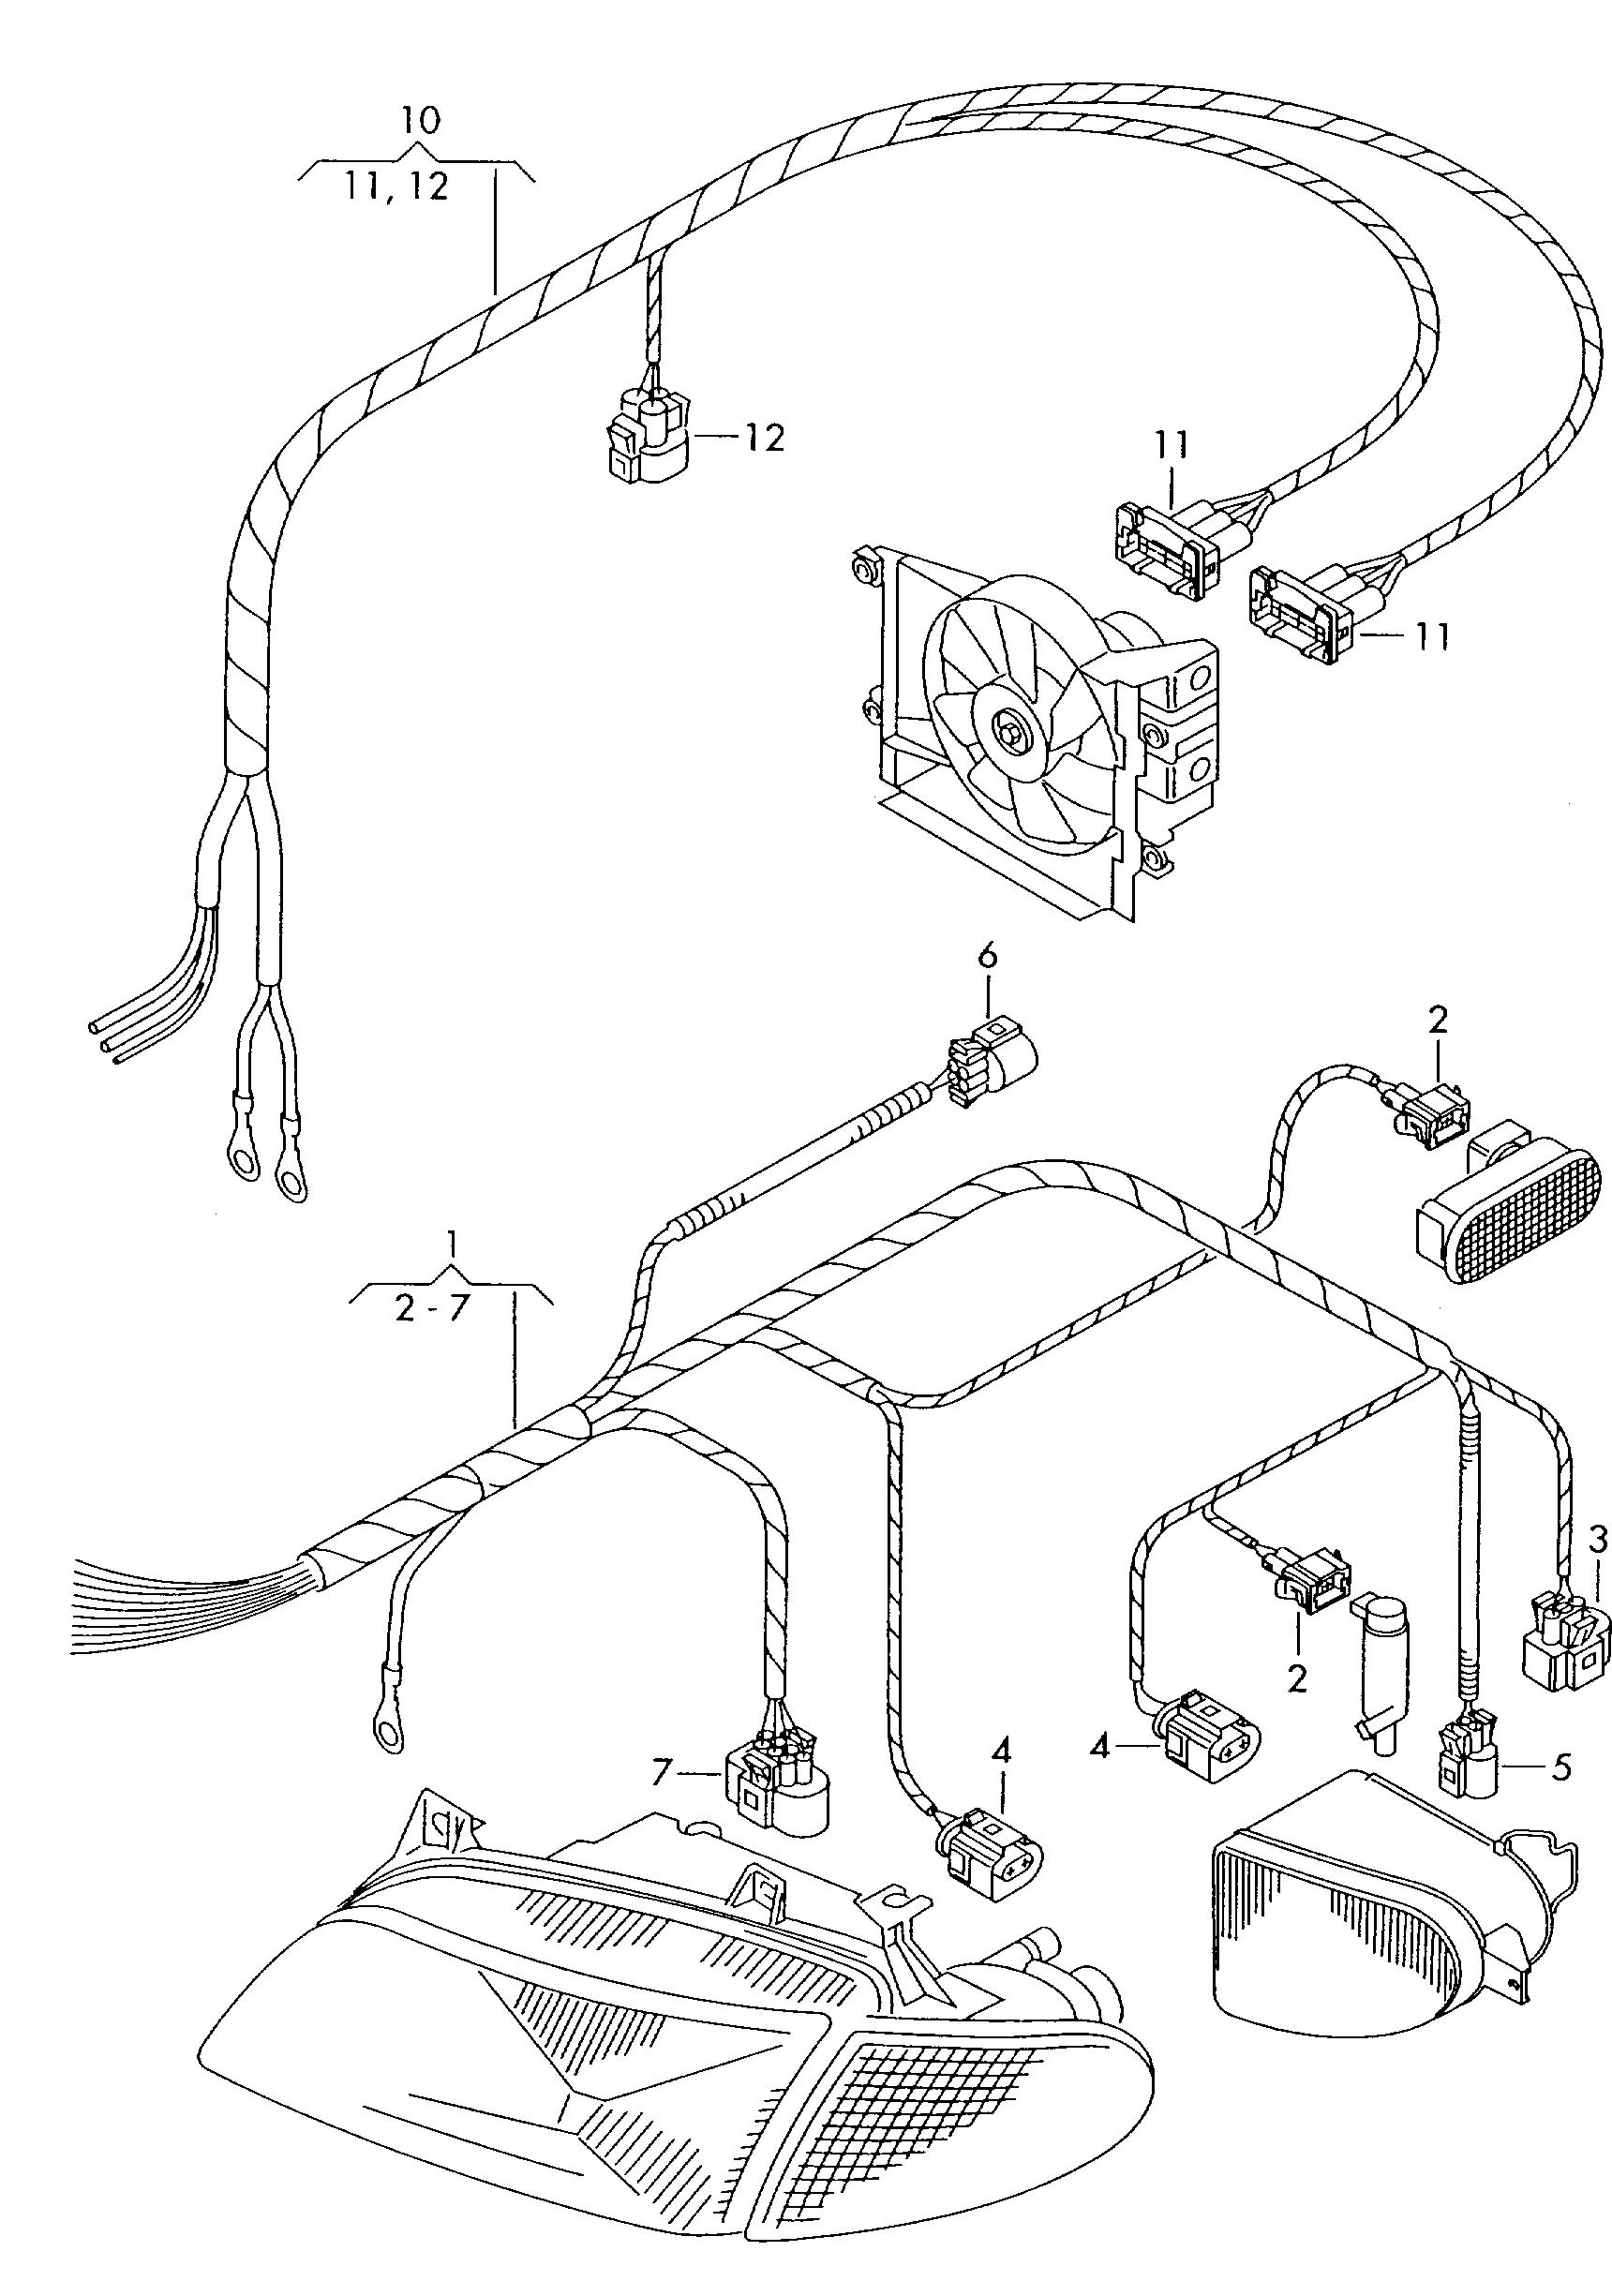 Volkswagen Sharan 1996 2000 For Radiator Fan Part Section Wiring Harness Vag Etka